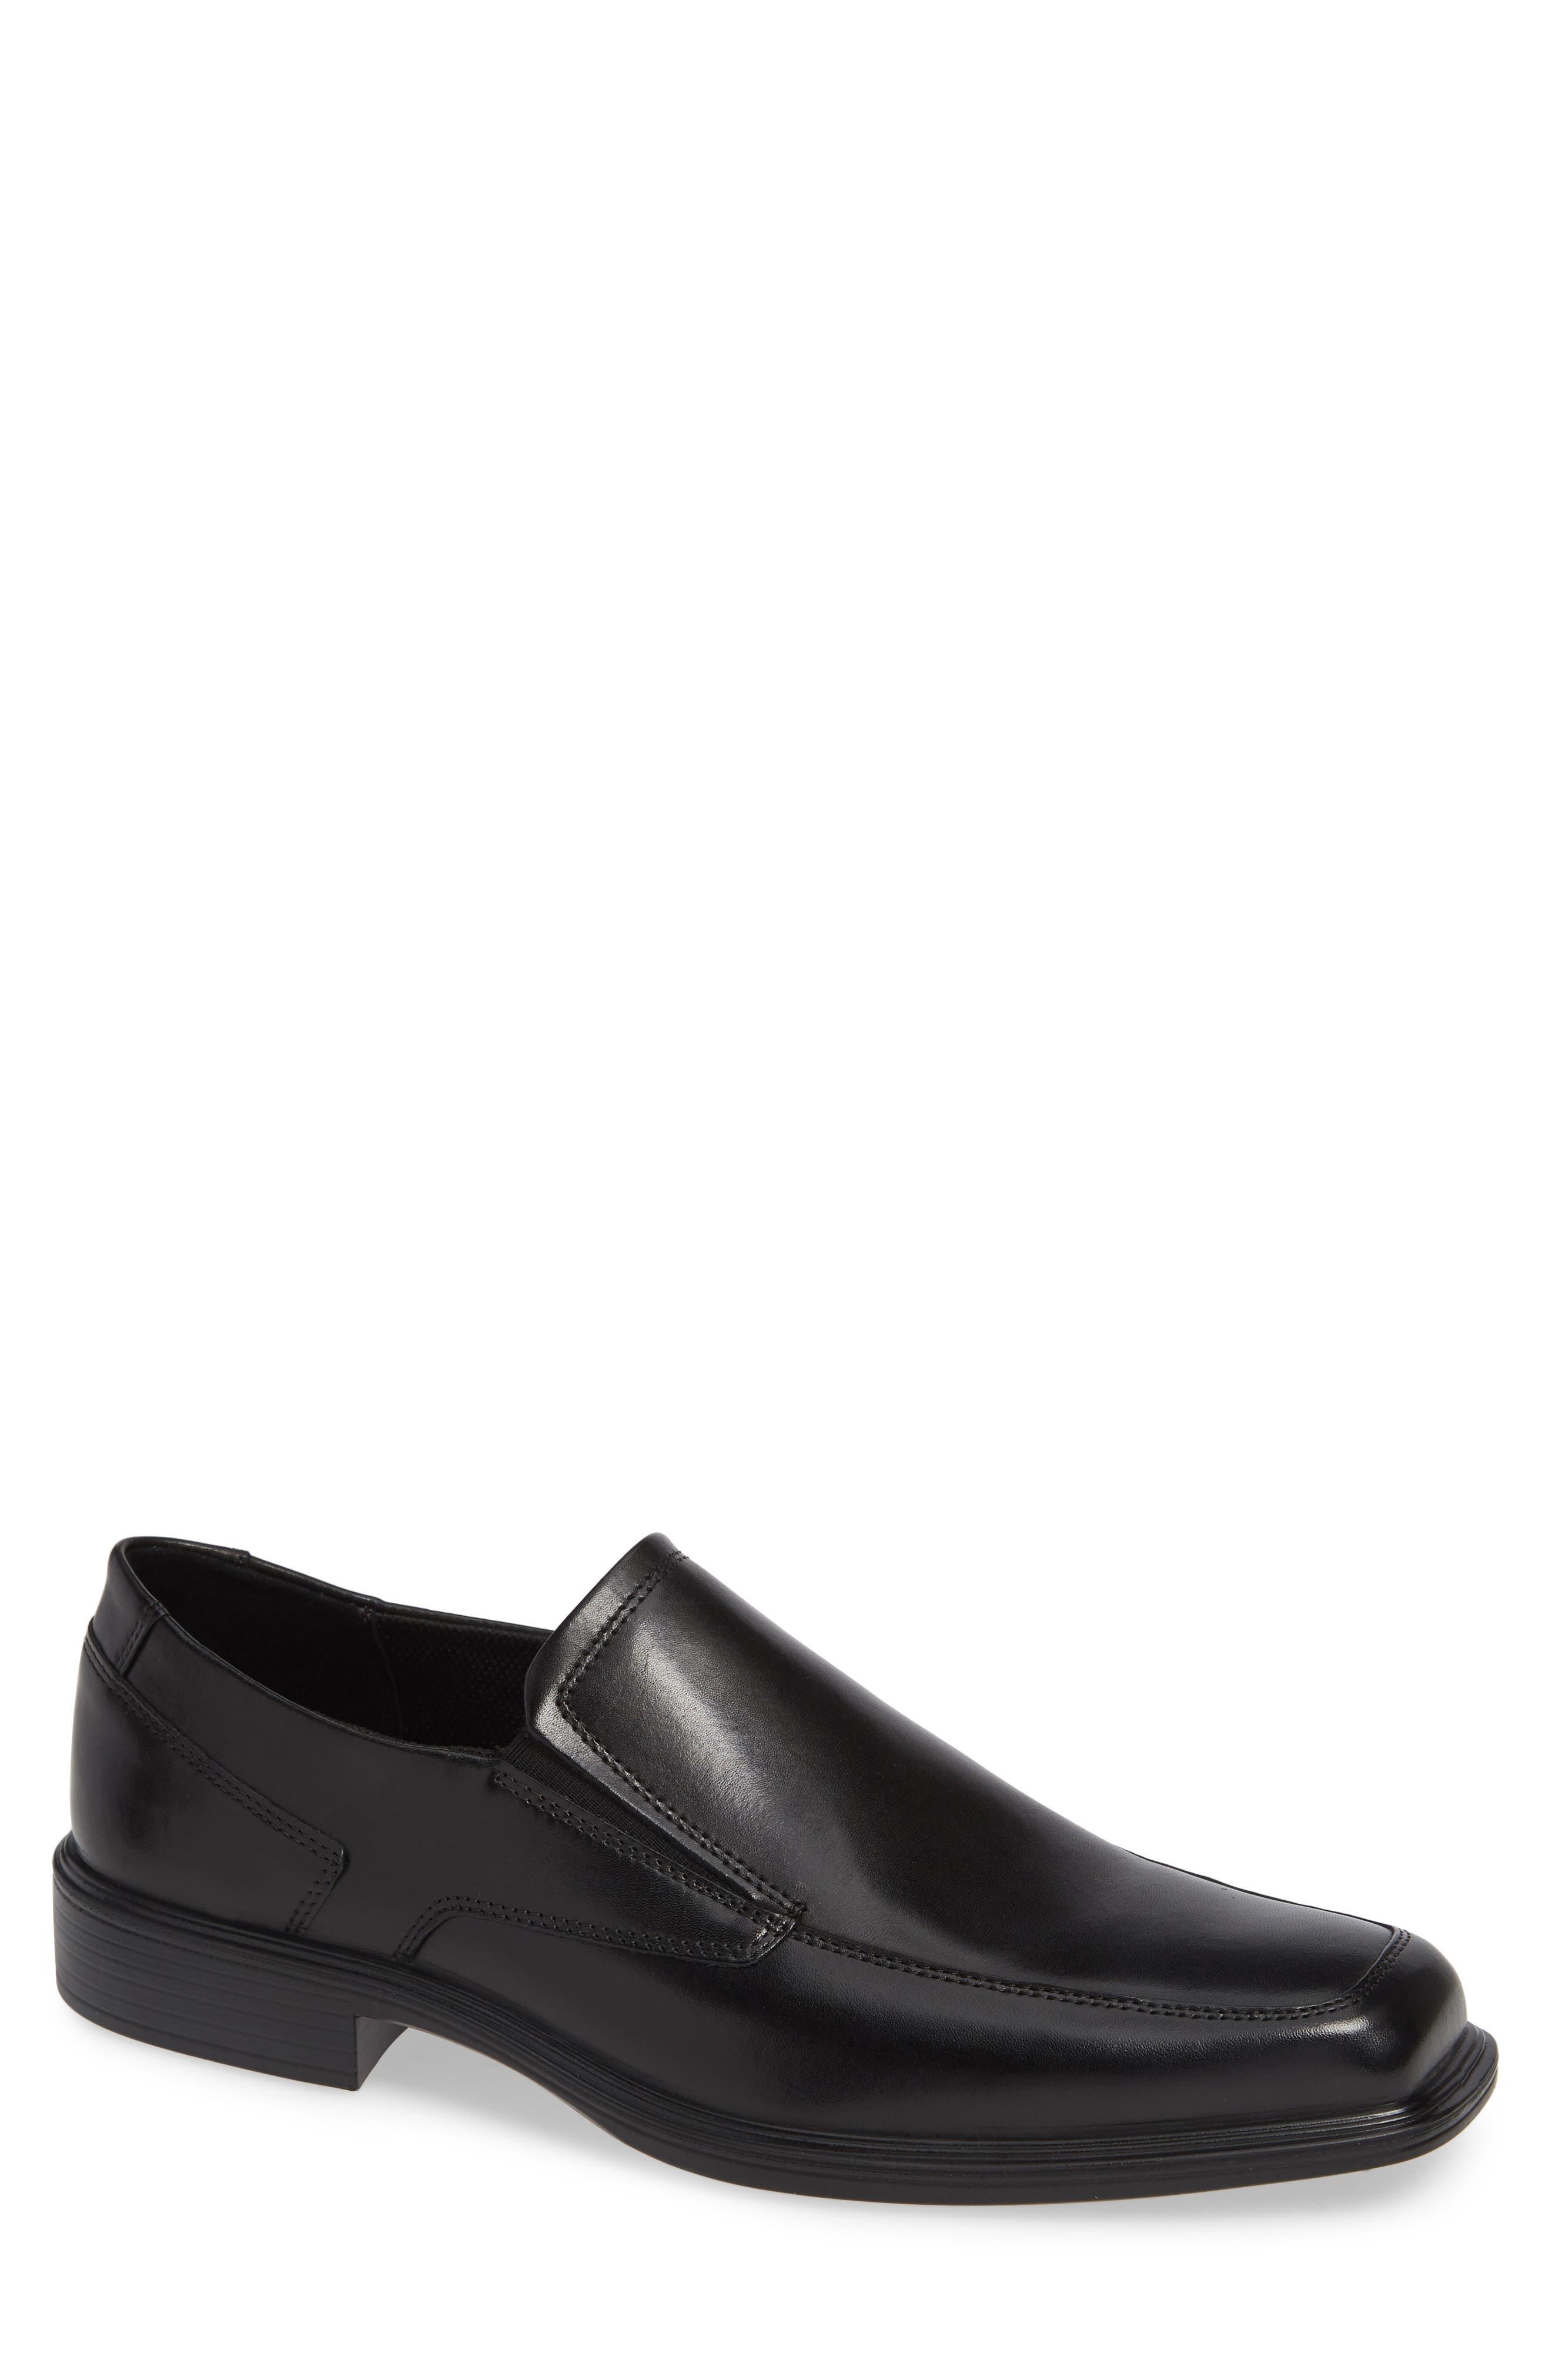 Minneapolis Venetian Loafer,                         Main,                         color, BLACK/BLACK LEATHER